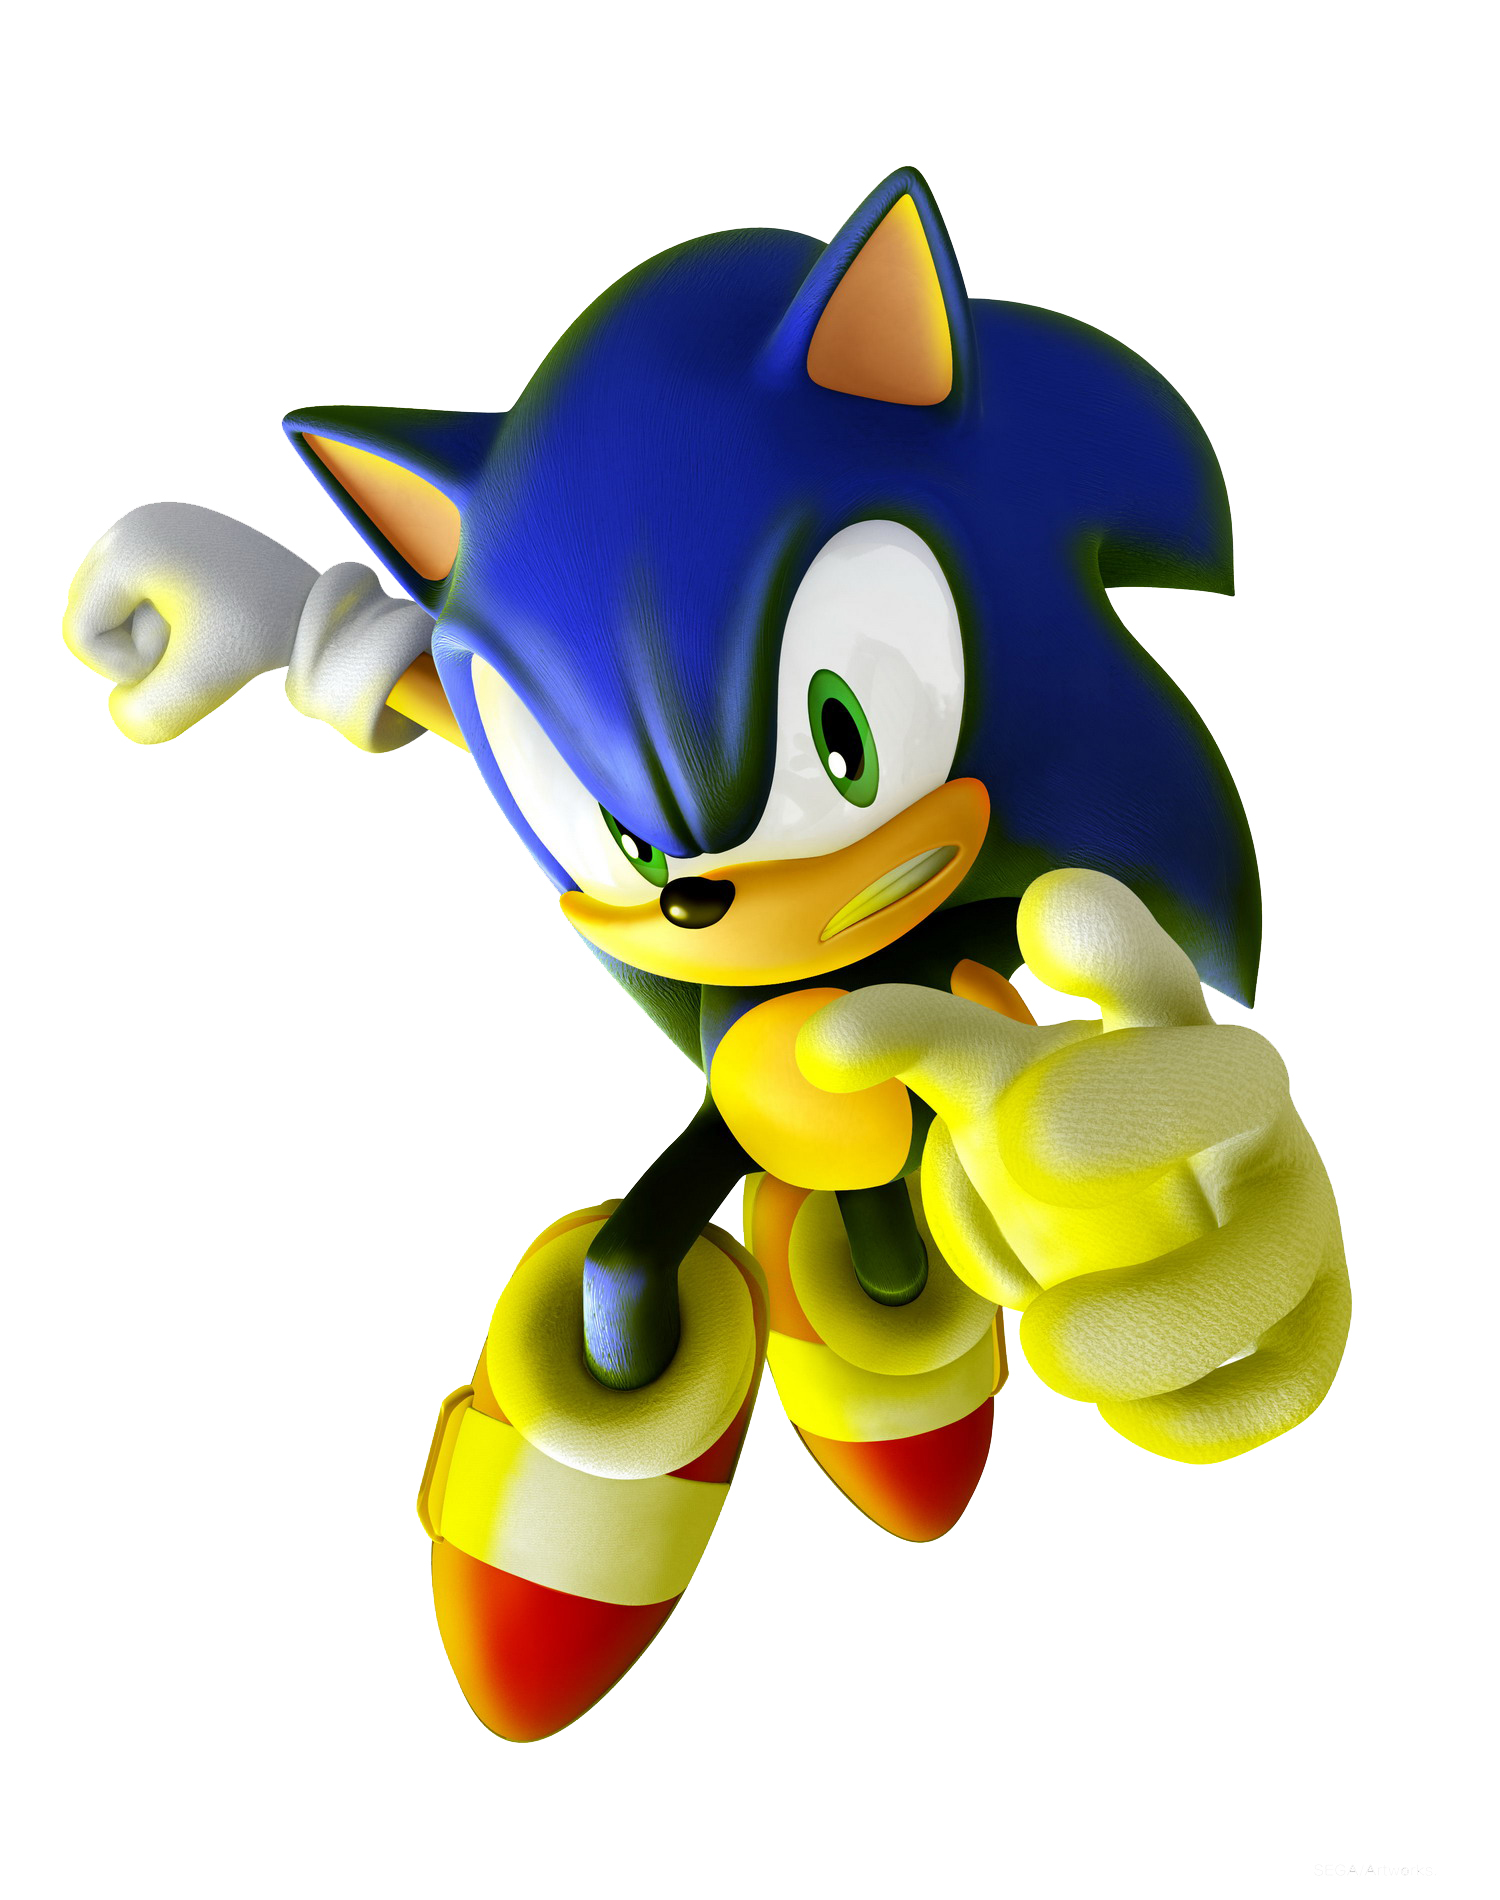 sonic the hedgehog digital - photo #23